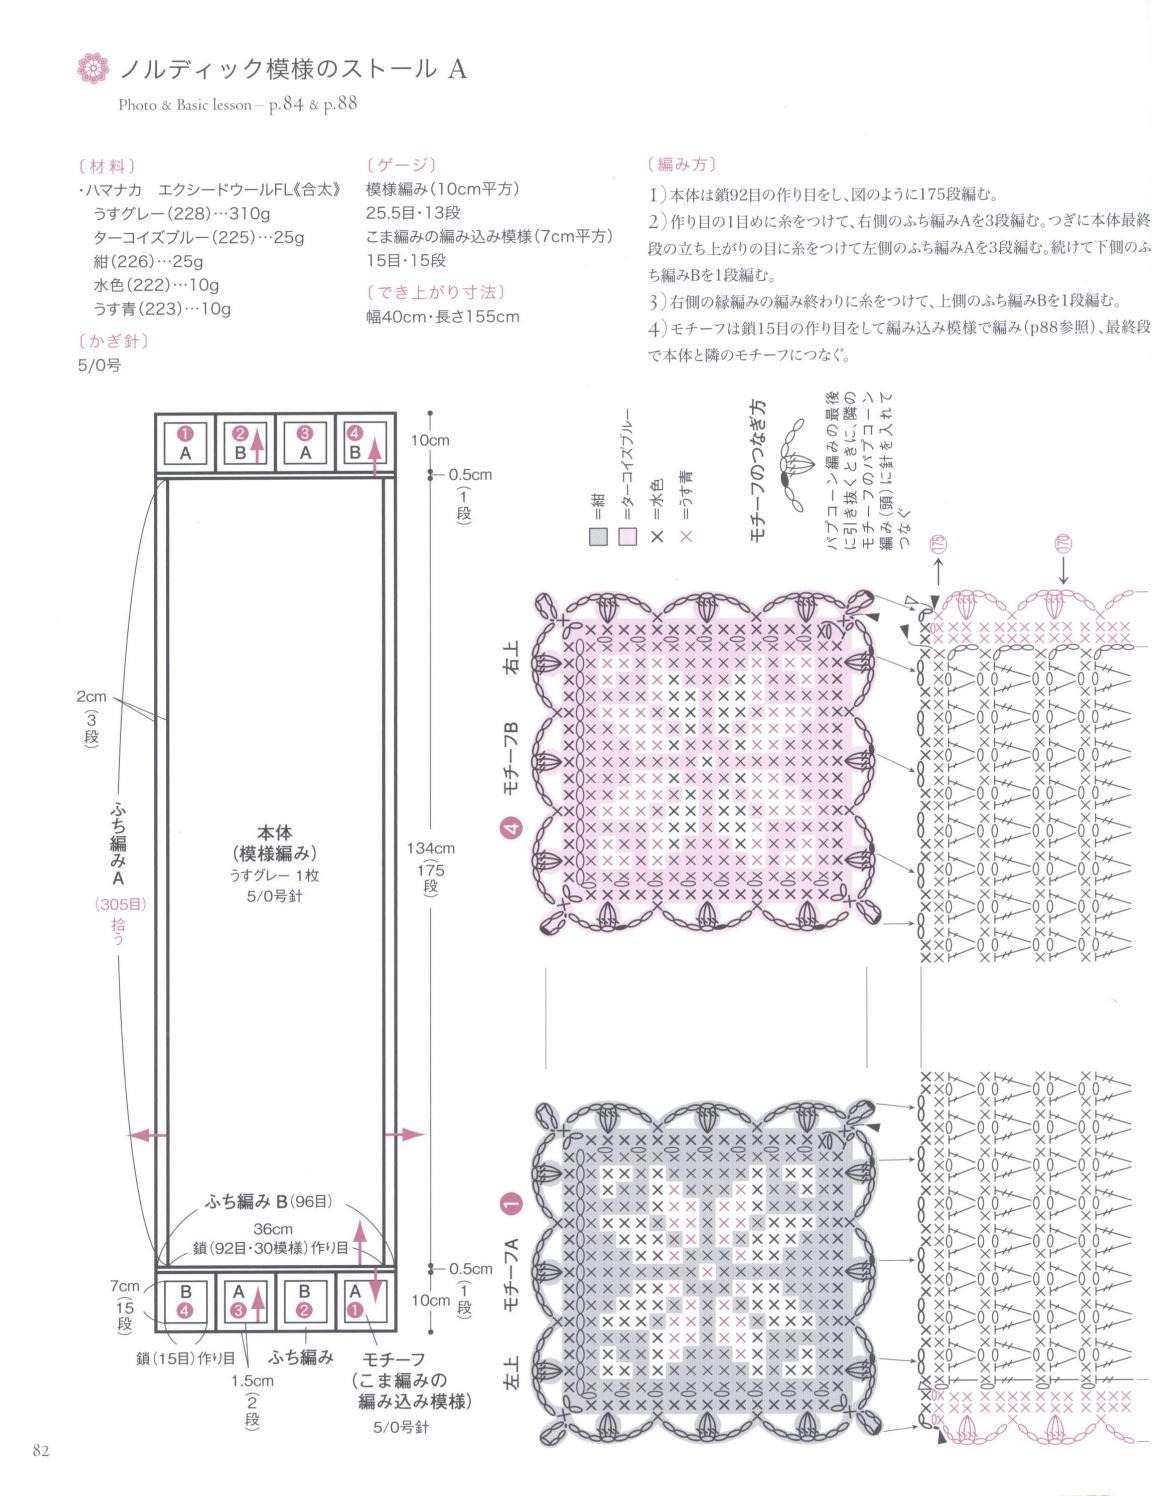 Asahi original crochet best selection 2012 page 82